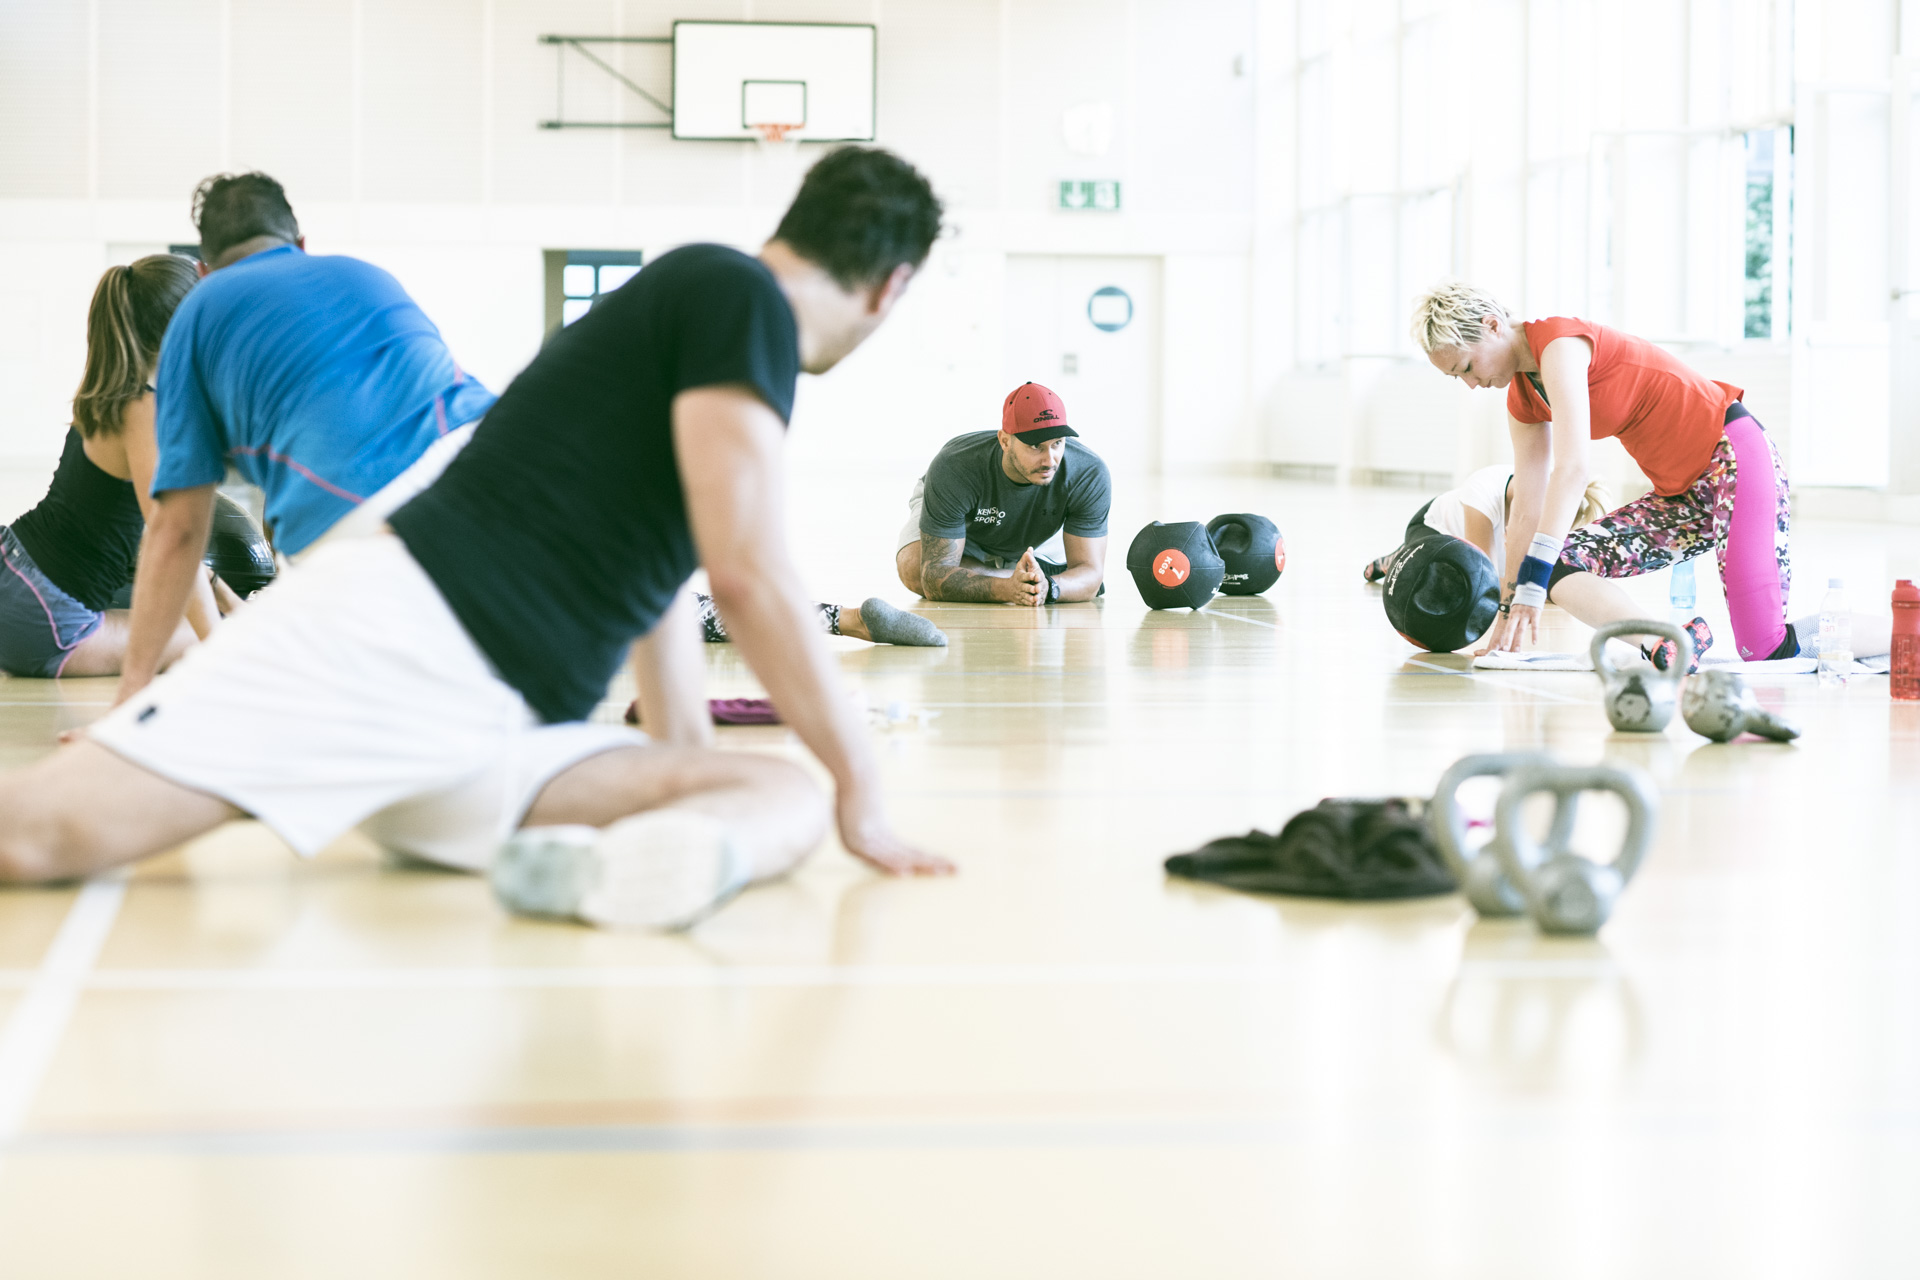 Kensho Sports